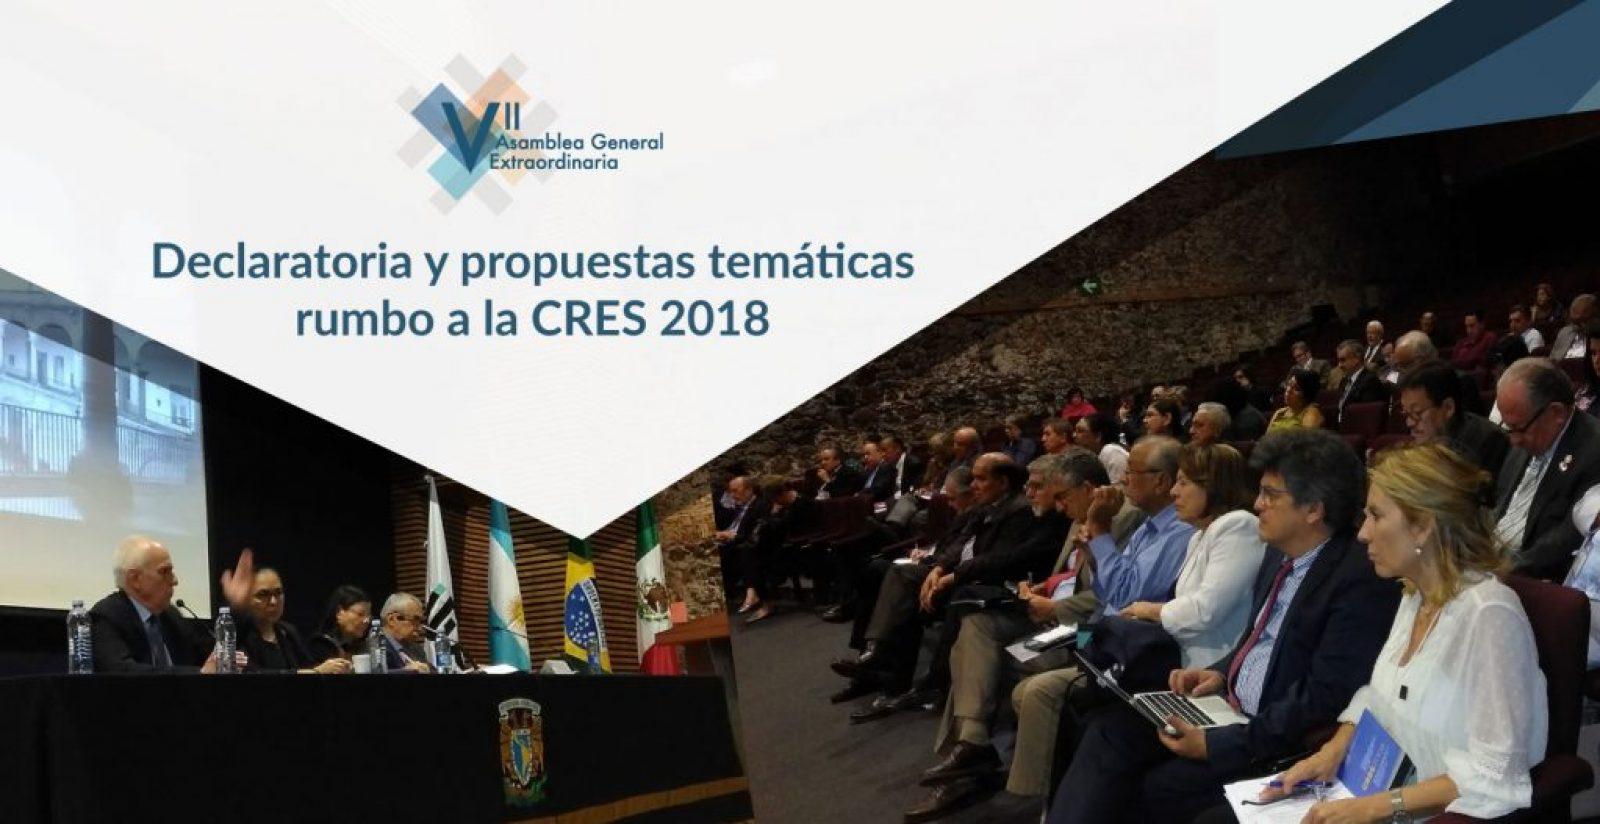 VII Asamblea General Extraordinaria UDUAL